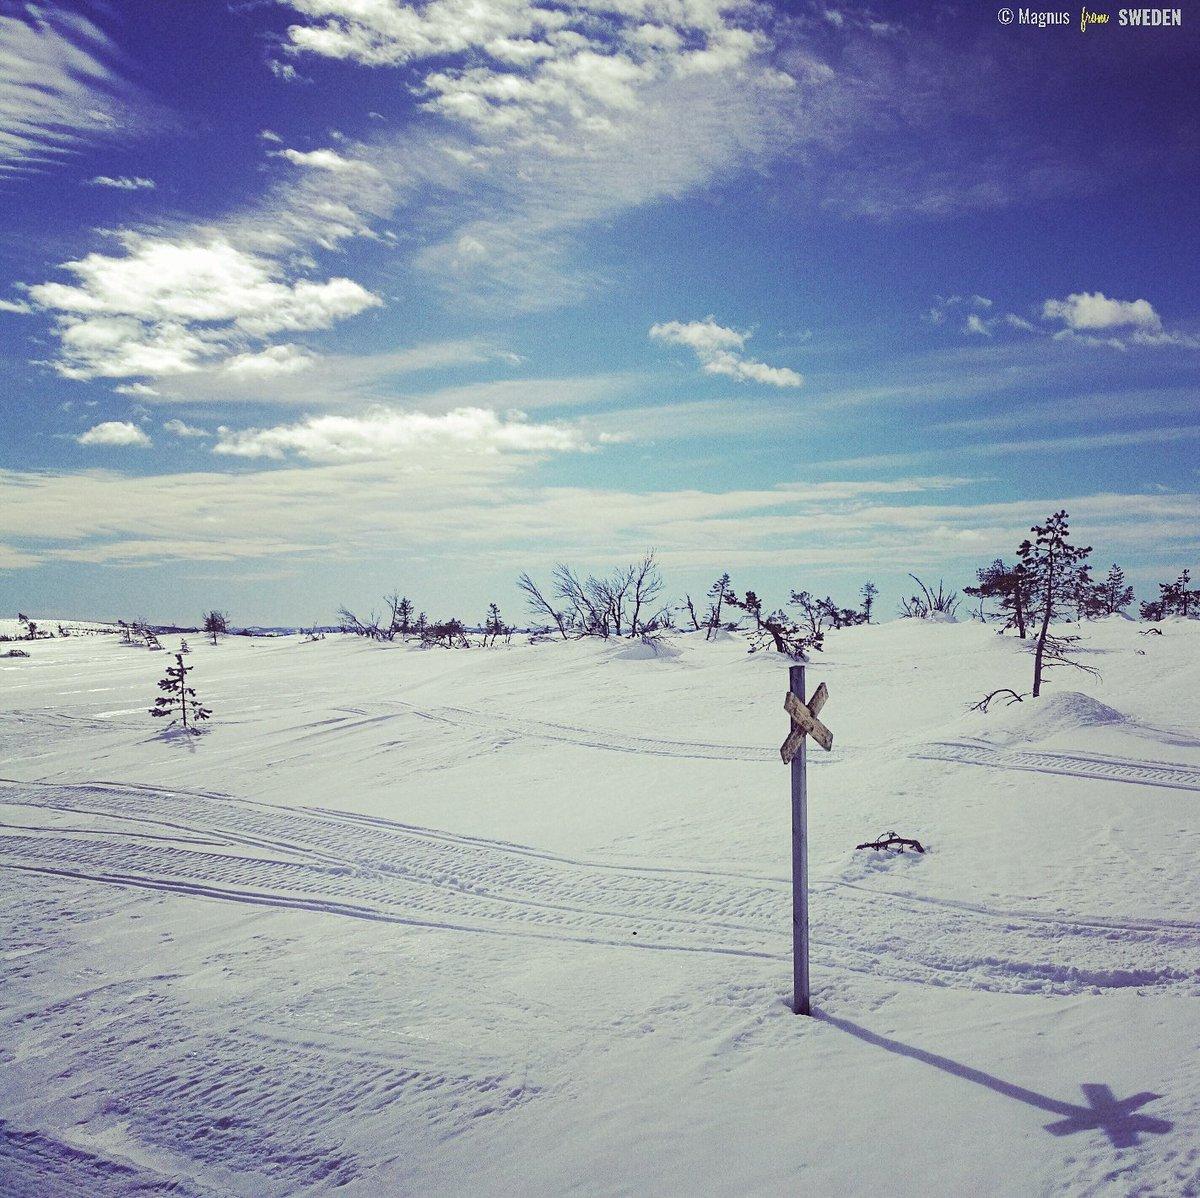 #snow #mondaymotivation #photography #500pxrtg #PhotoRTG https://t.co/...